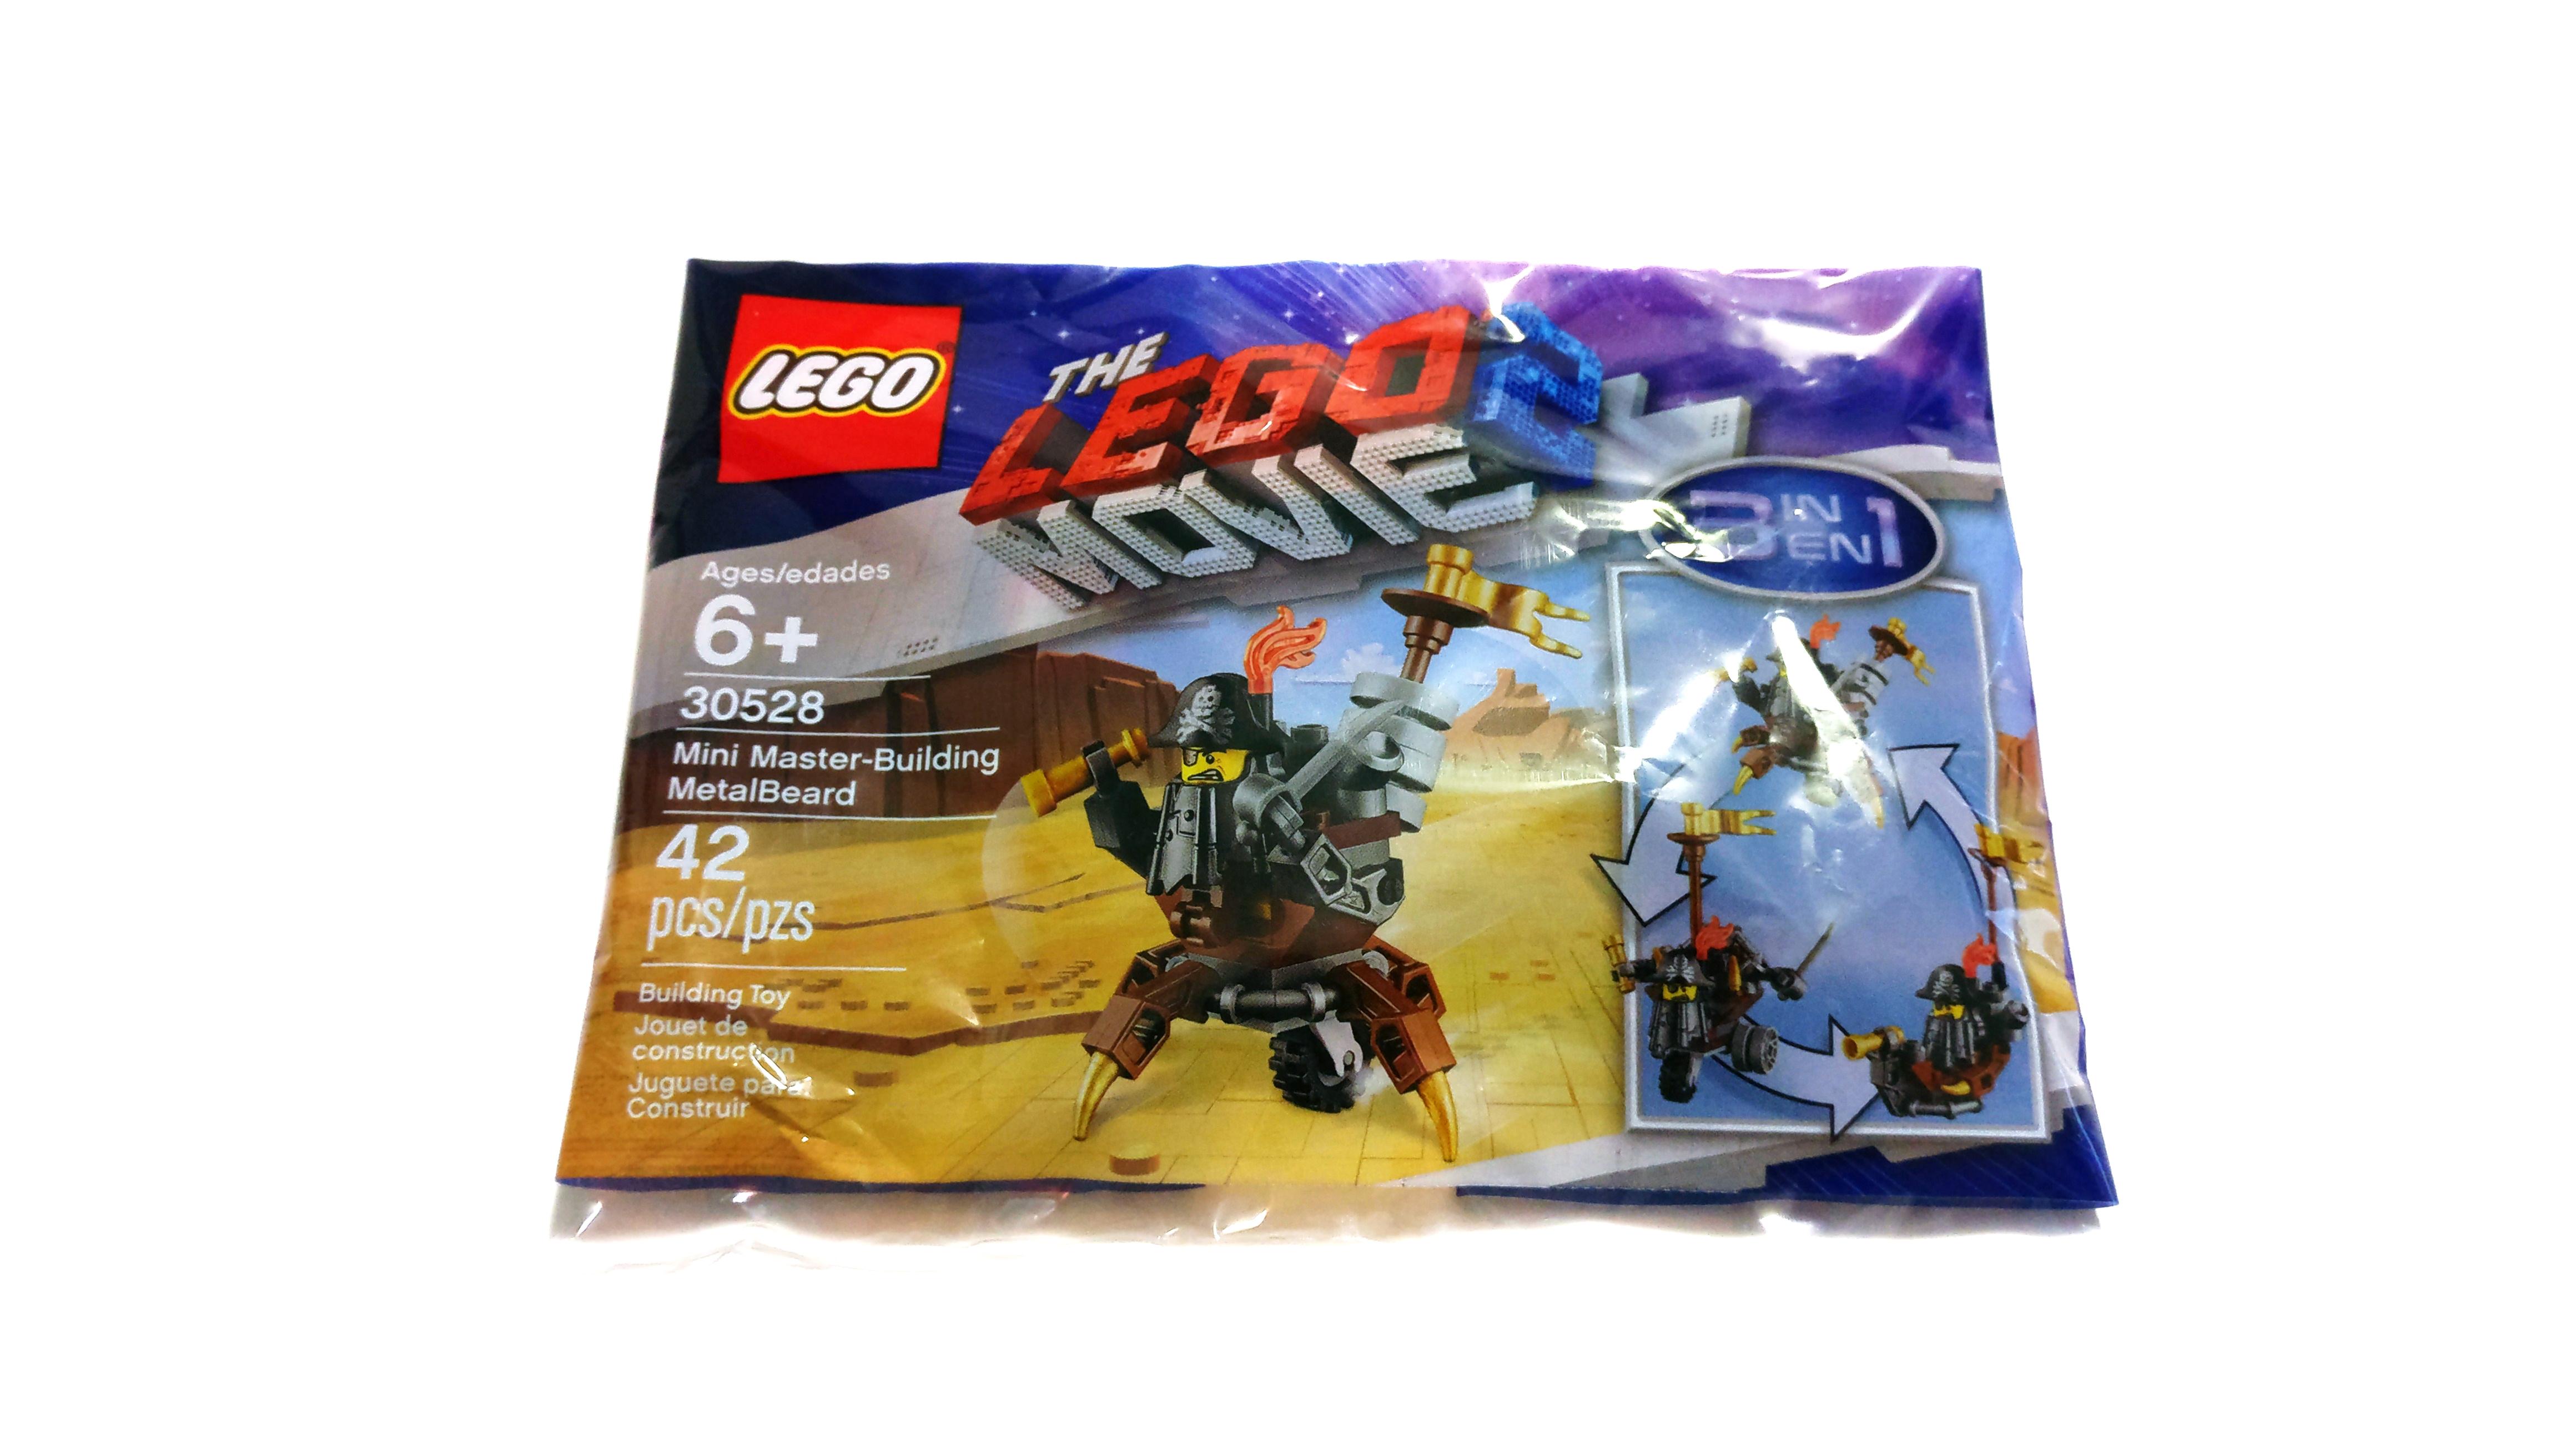 LEGO 30528 The LEGO Movie 2 Mini Master-Building MetalBeard Polybag 42pcs New